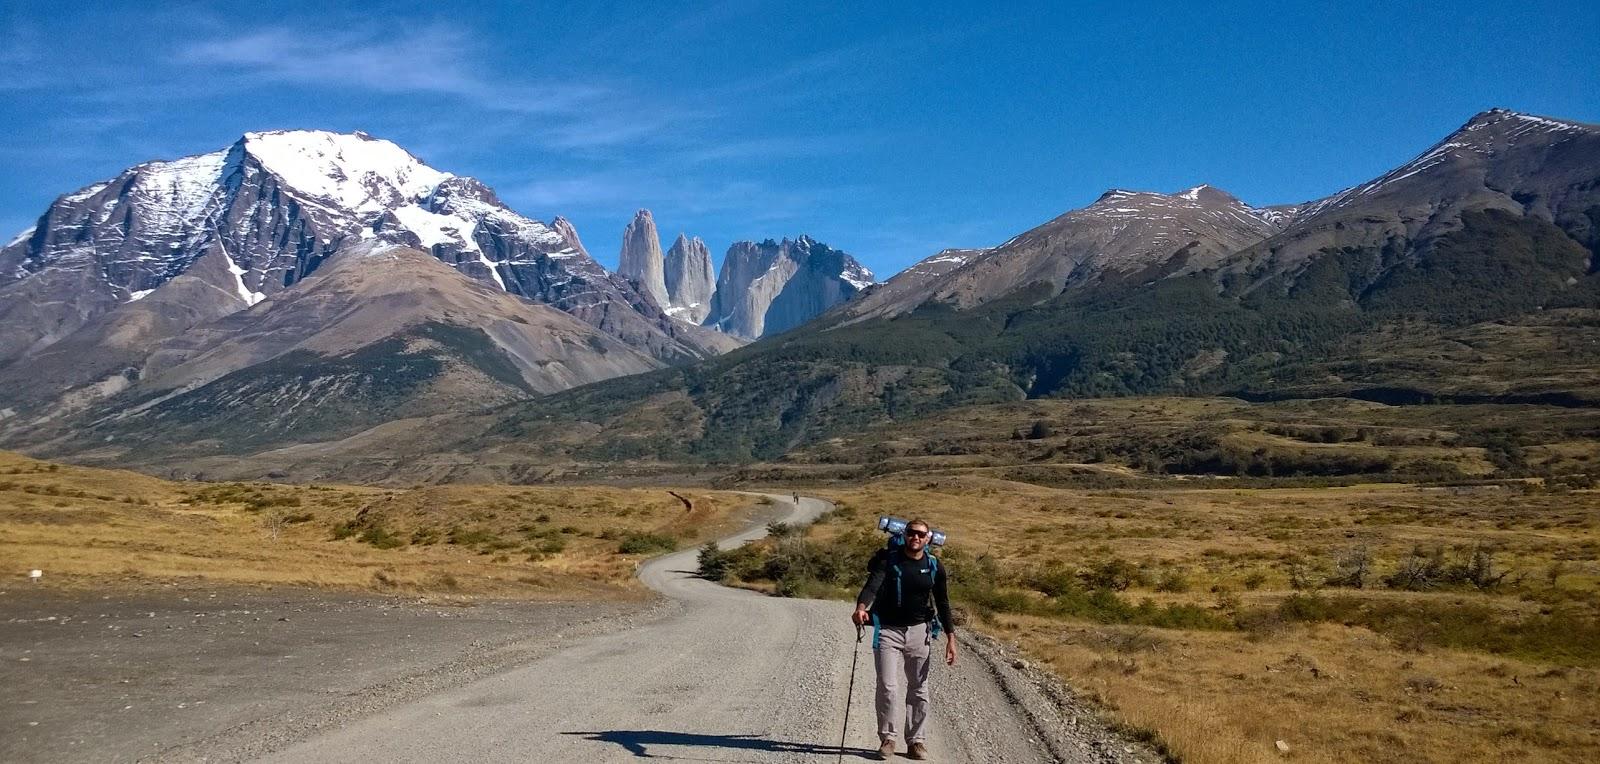 Circuito W Torres Del Paine : Mochileiros viajando torres del paine circuito w chile